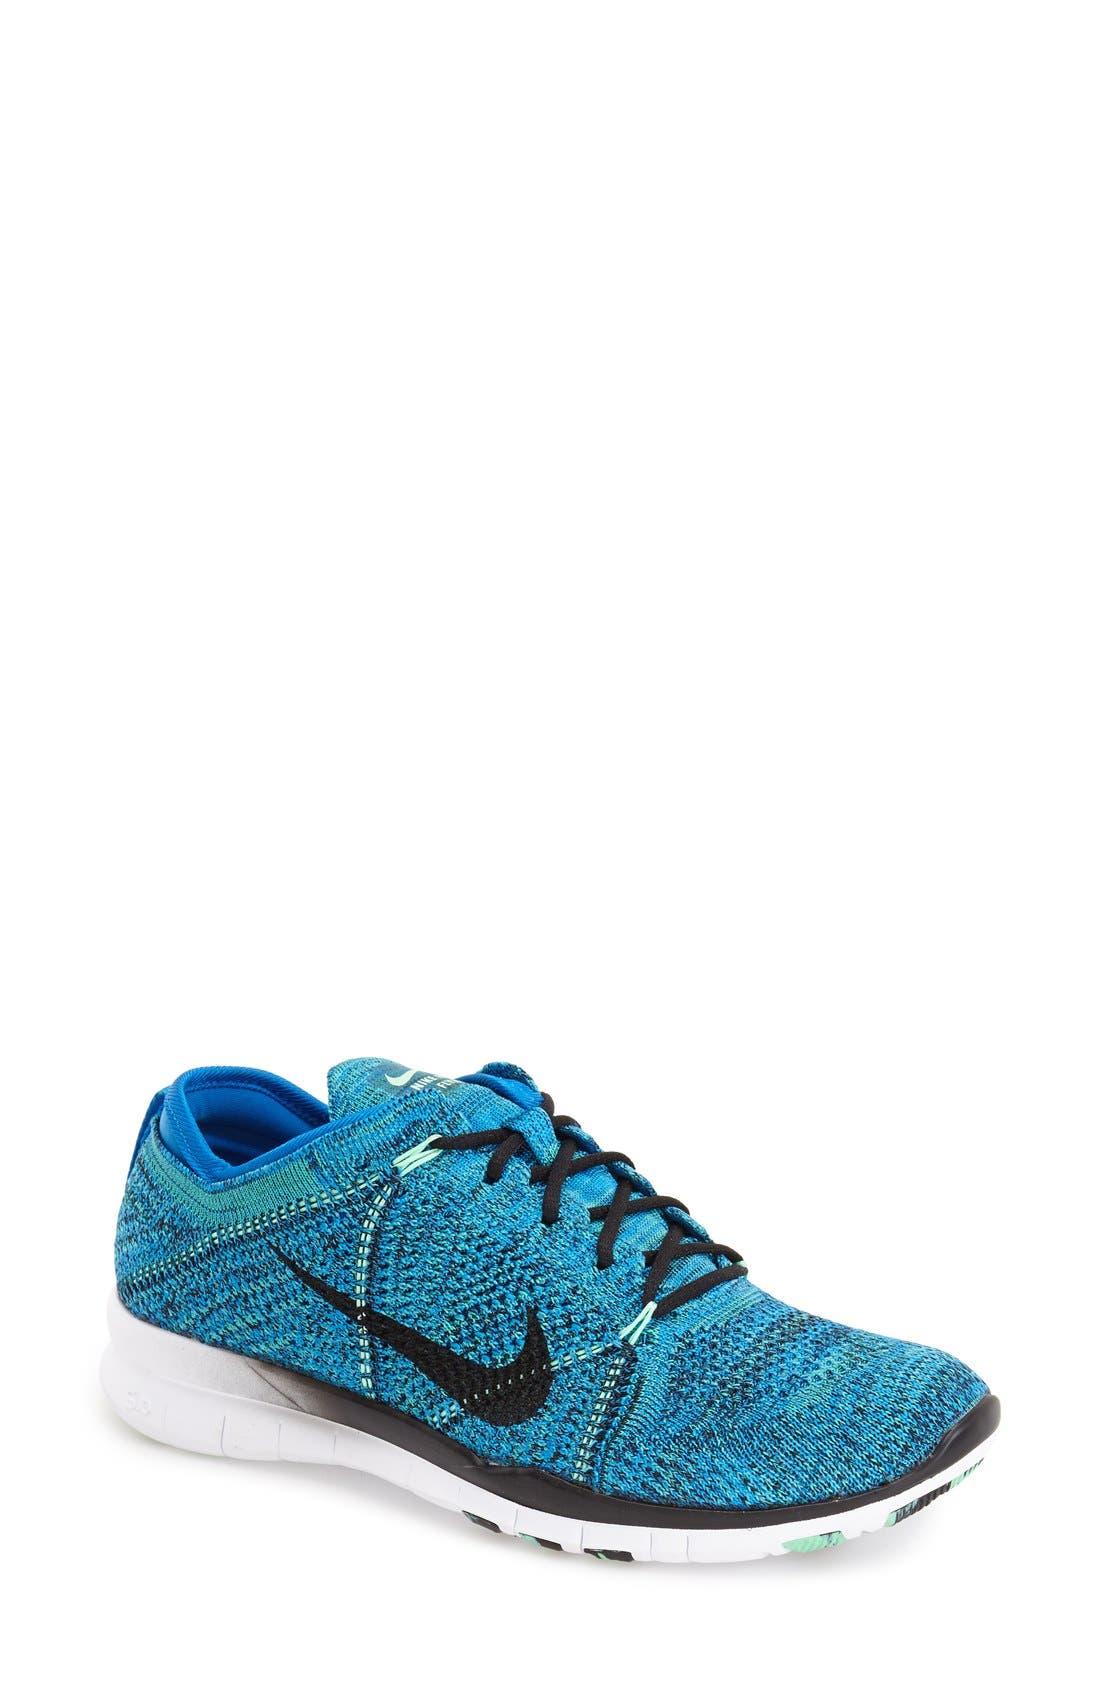 ,                             'Free Flyknit 5.0 TR' Training Shoe,                             Main thumbnail 28, color,                             401